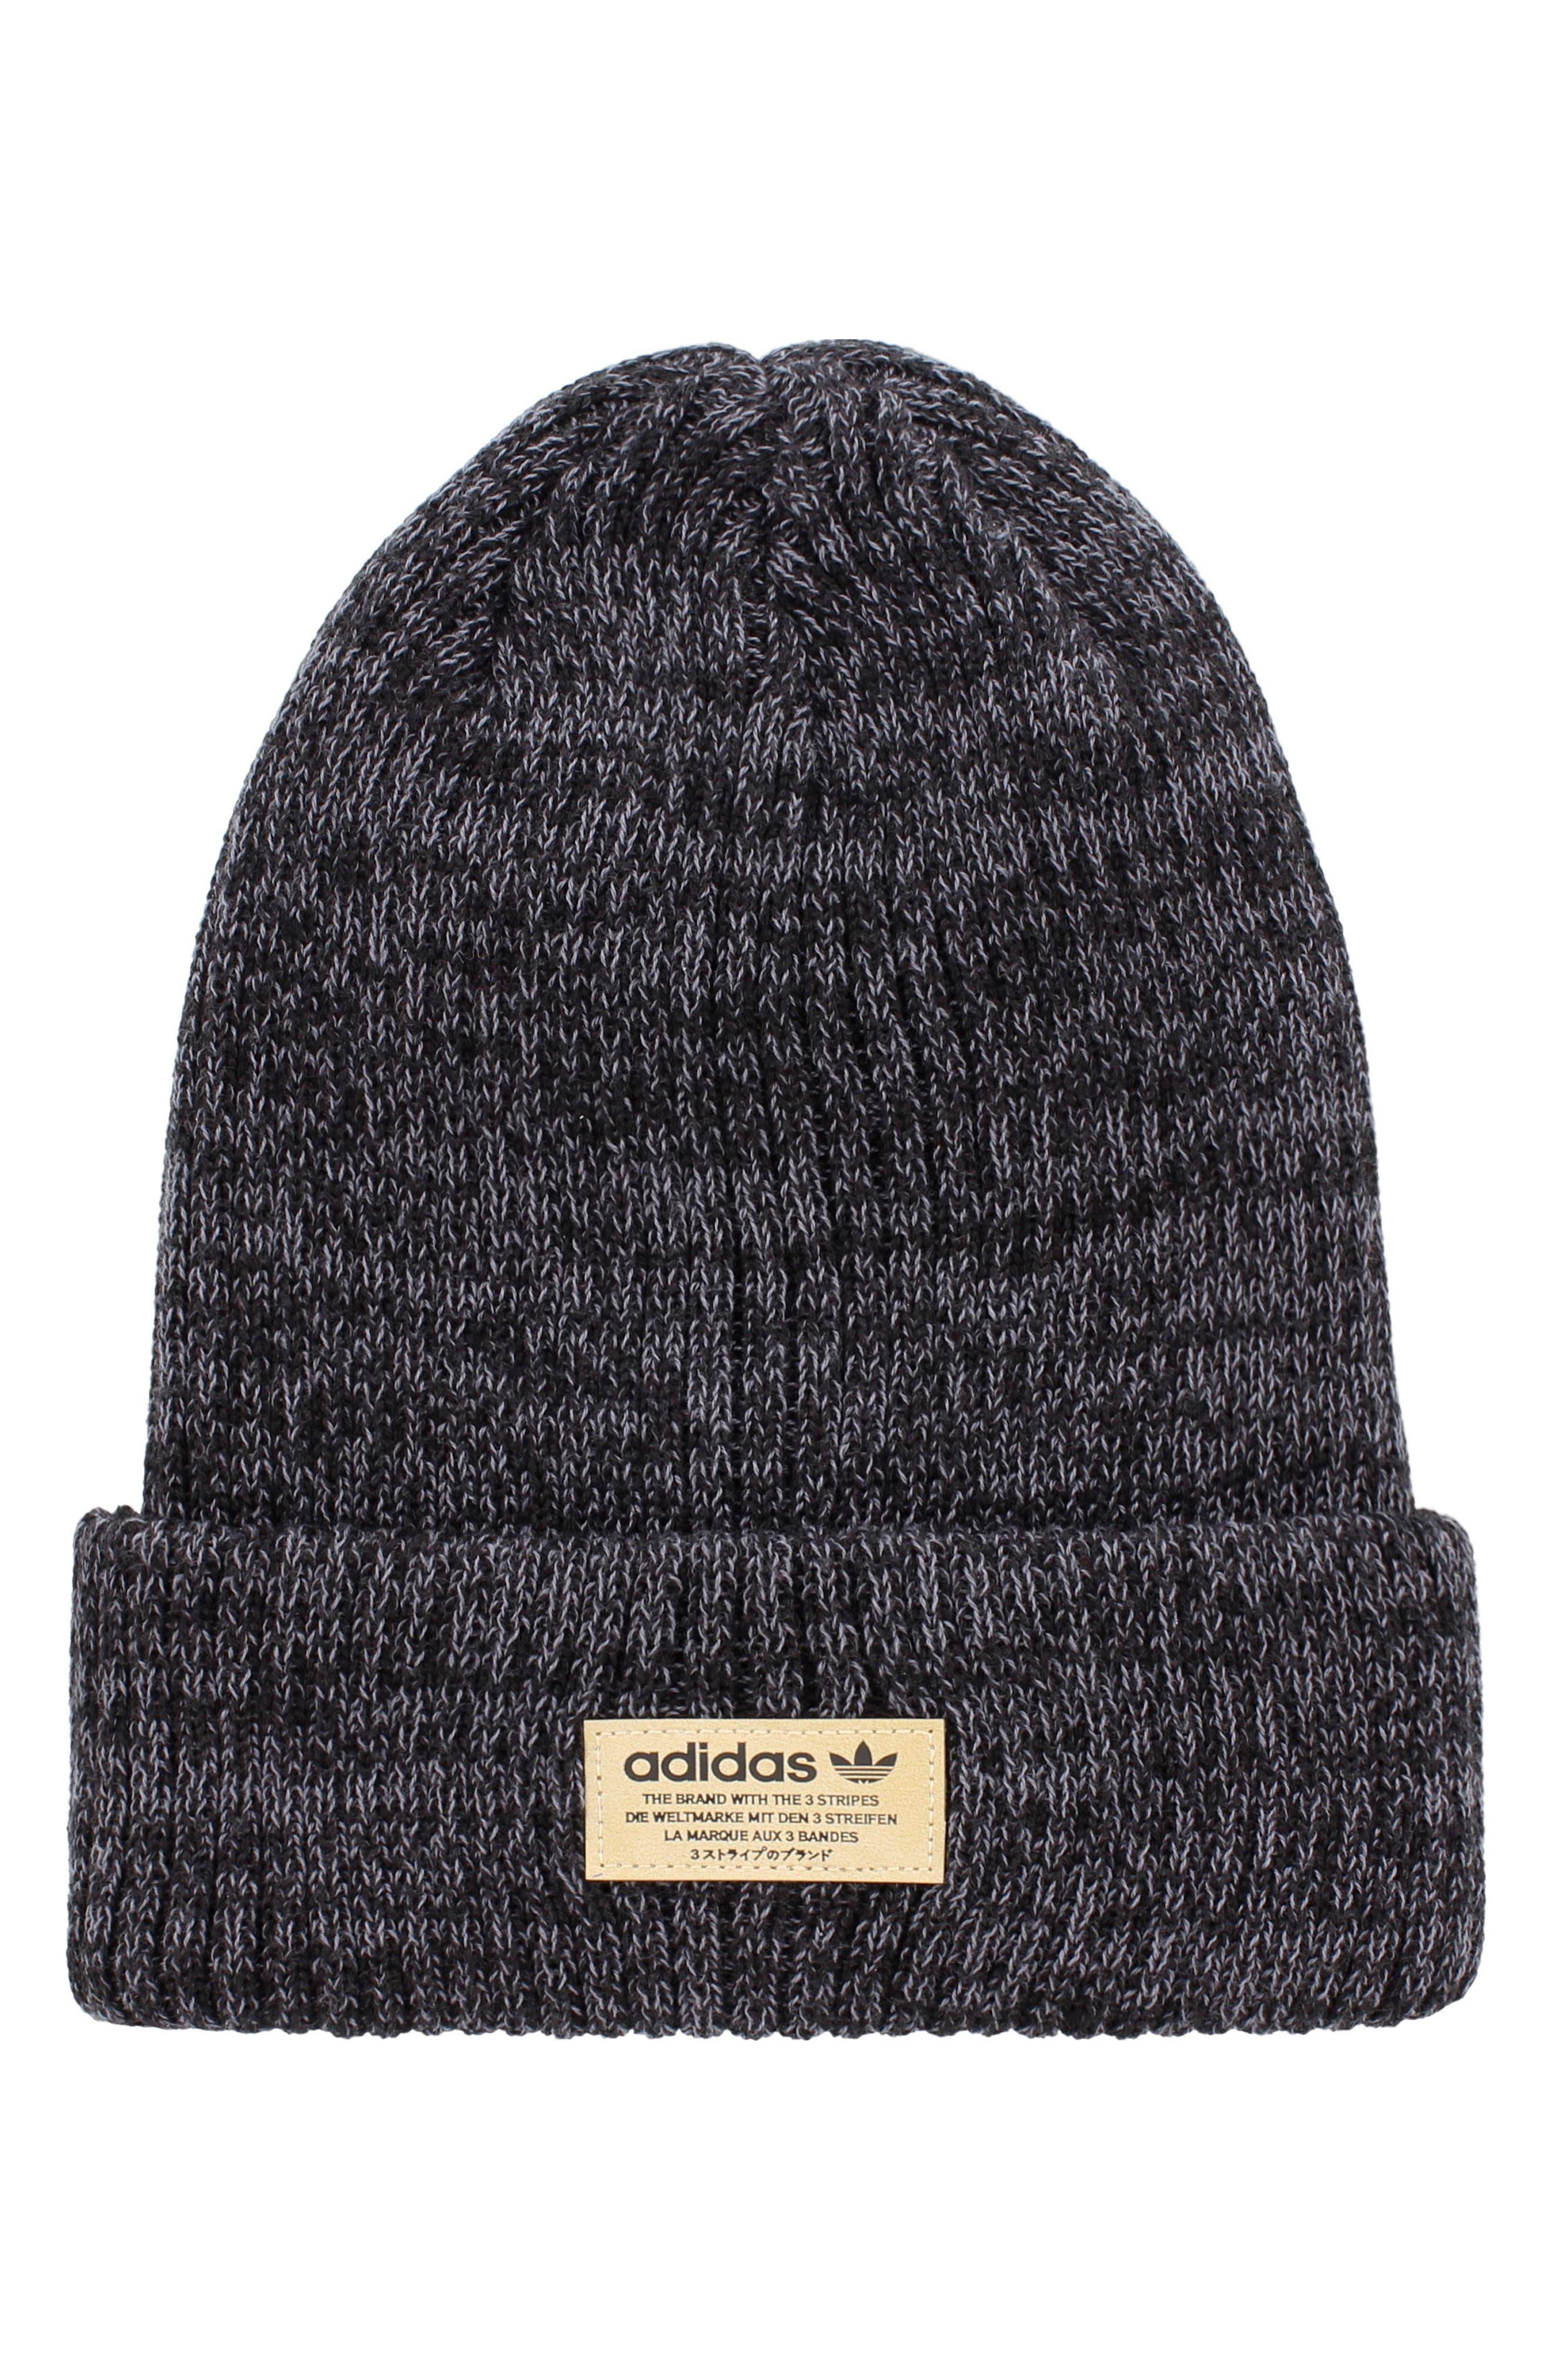 adidas NMD Knit Cap